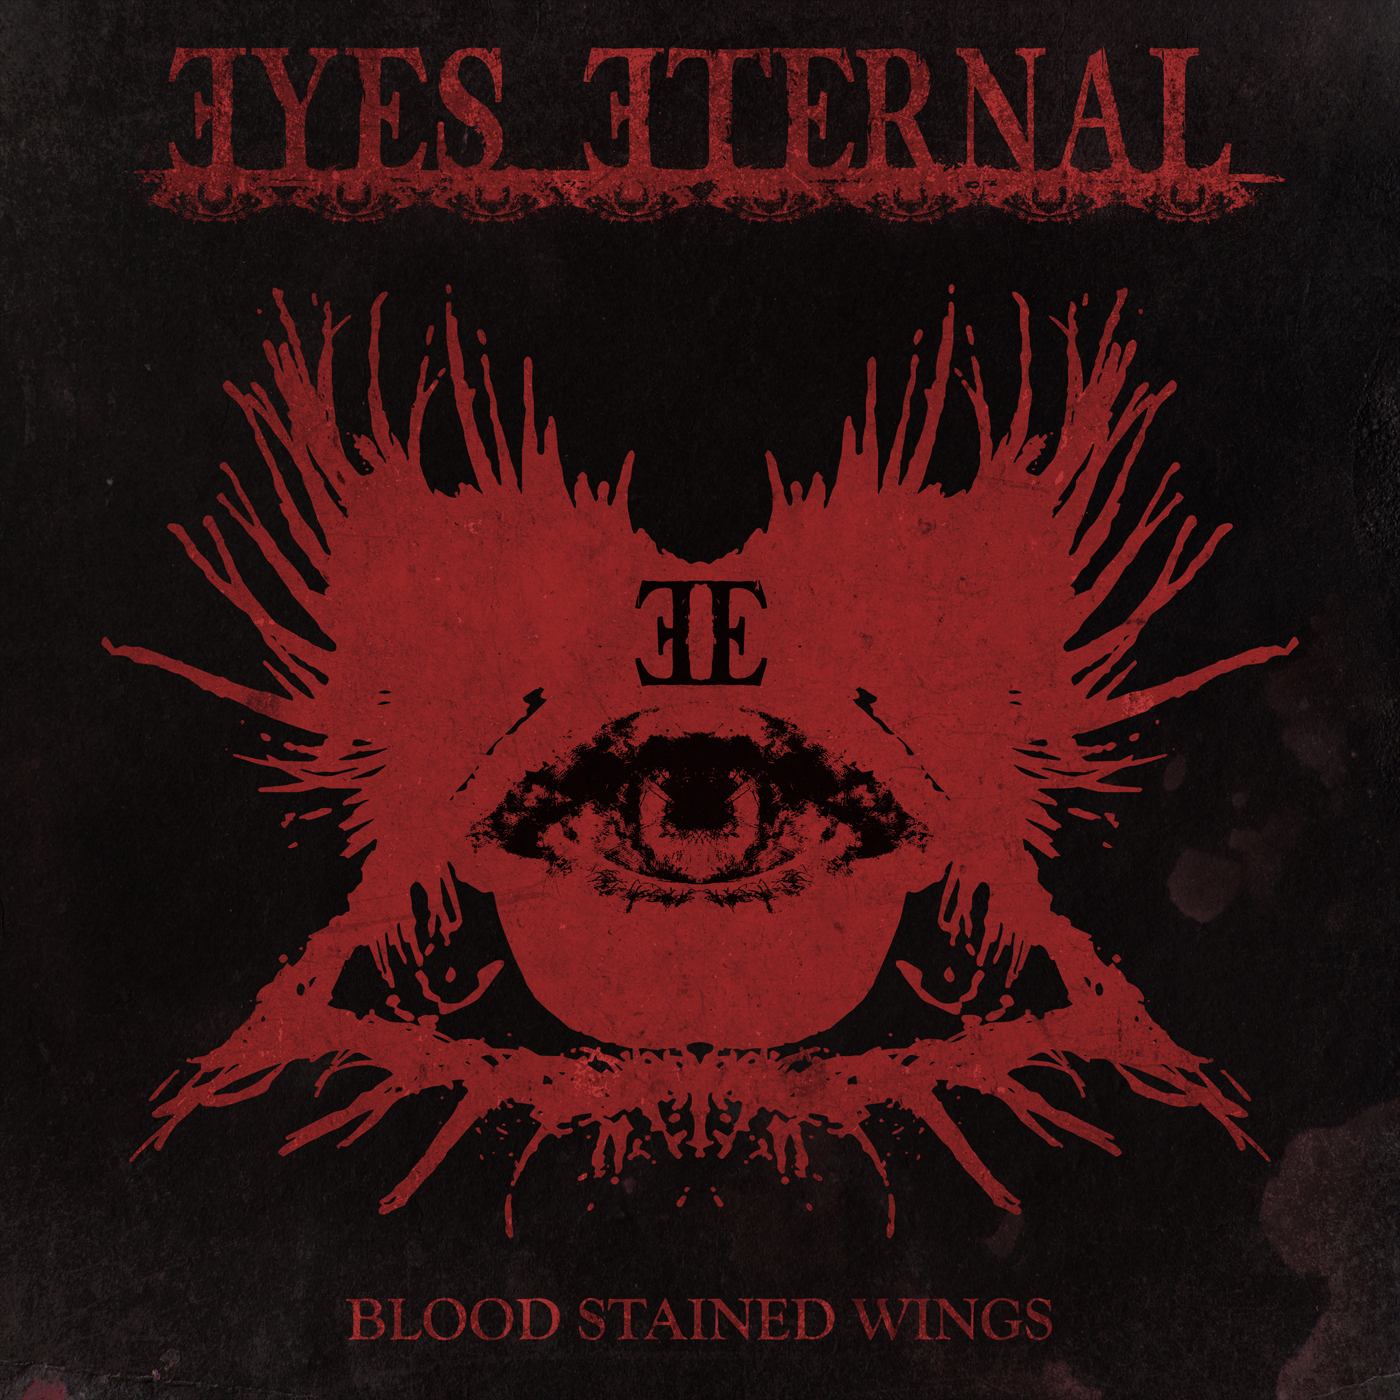 Eyes Eternal - Blood Stained Wings